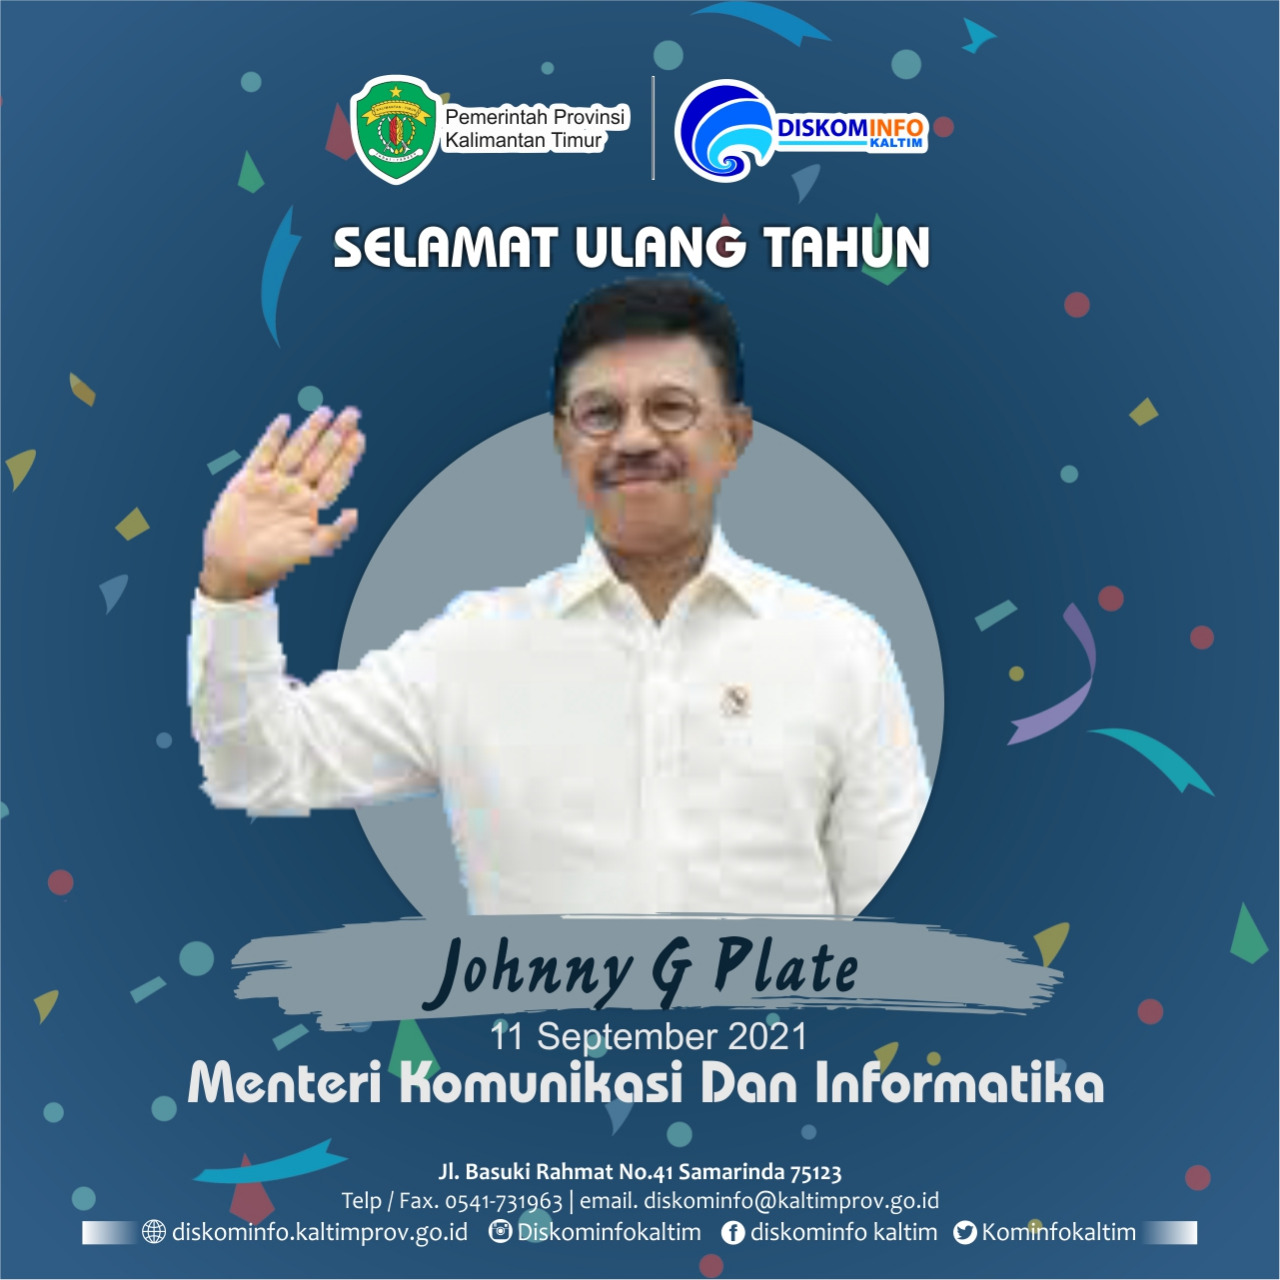 Selamat Ulang Tahun Kepada Menteri Komunikasi dan Informatika, Johnny G Plate